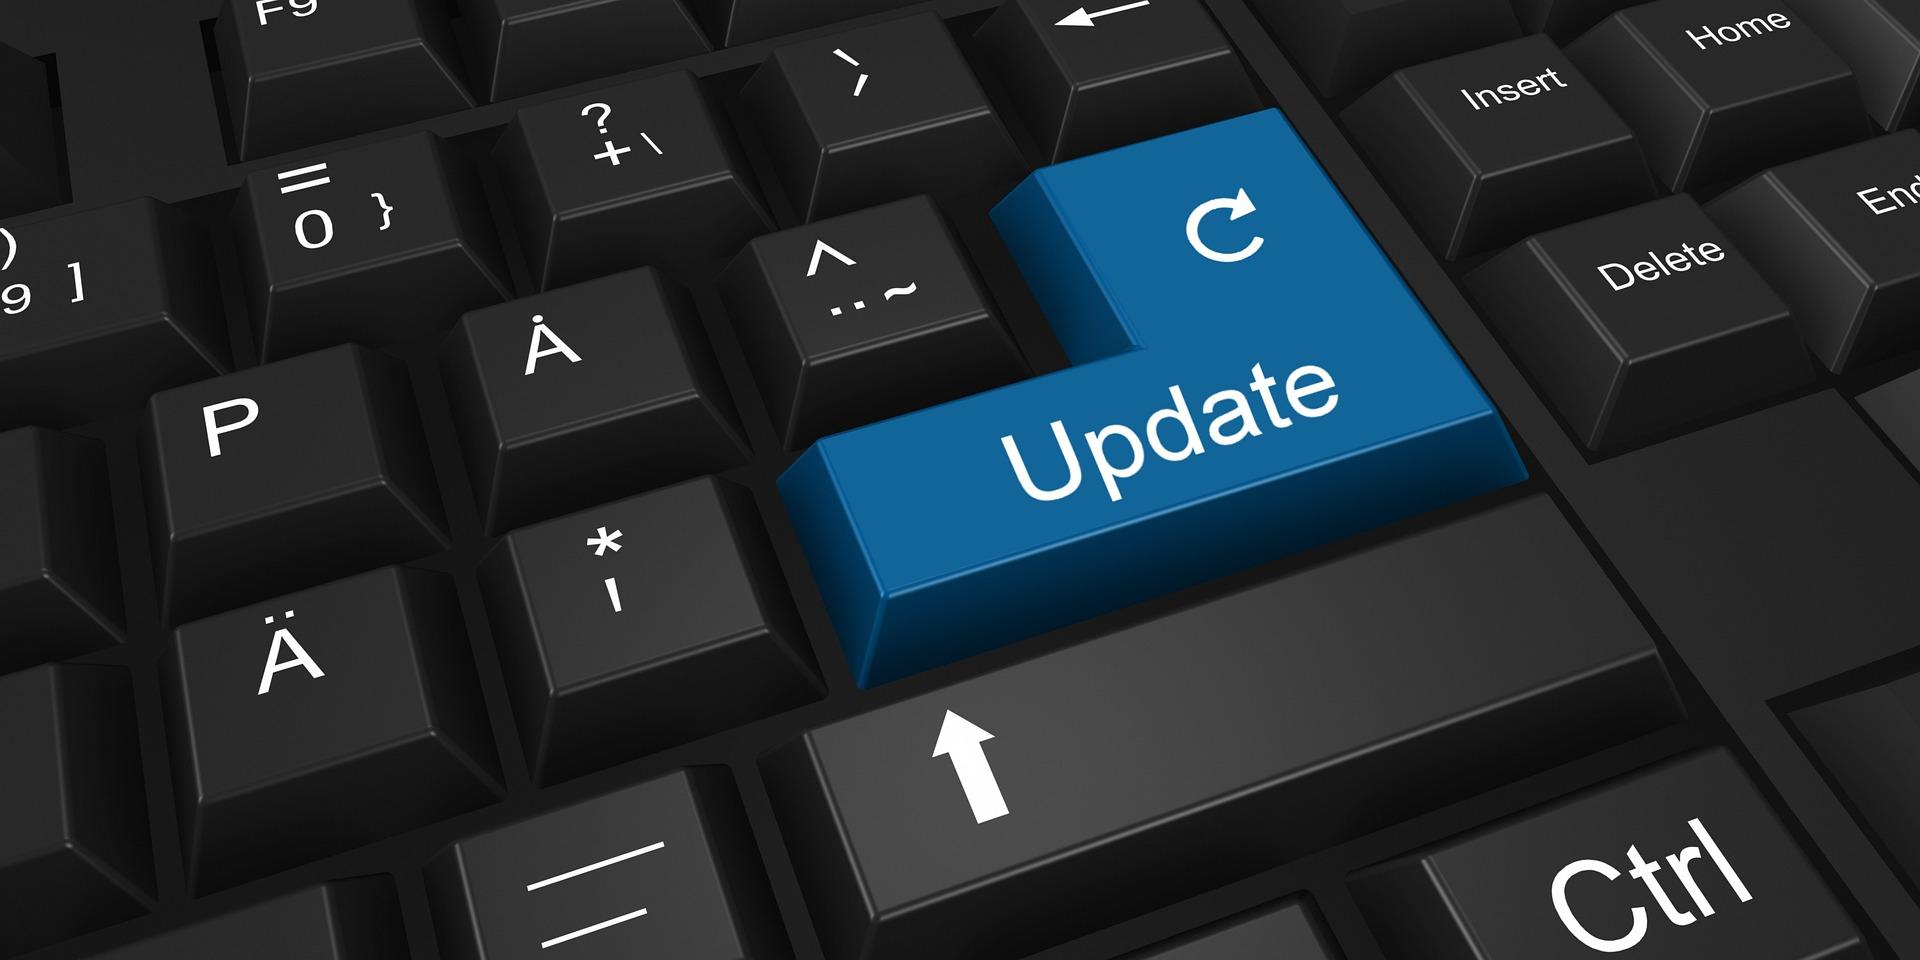 update-4223736_1920.jpg